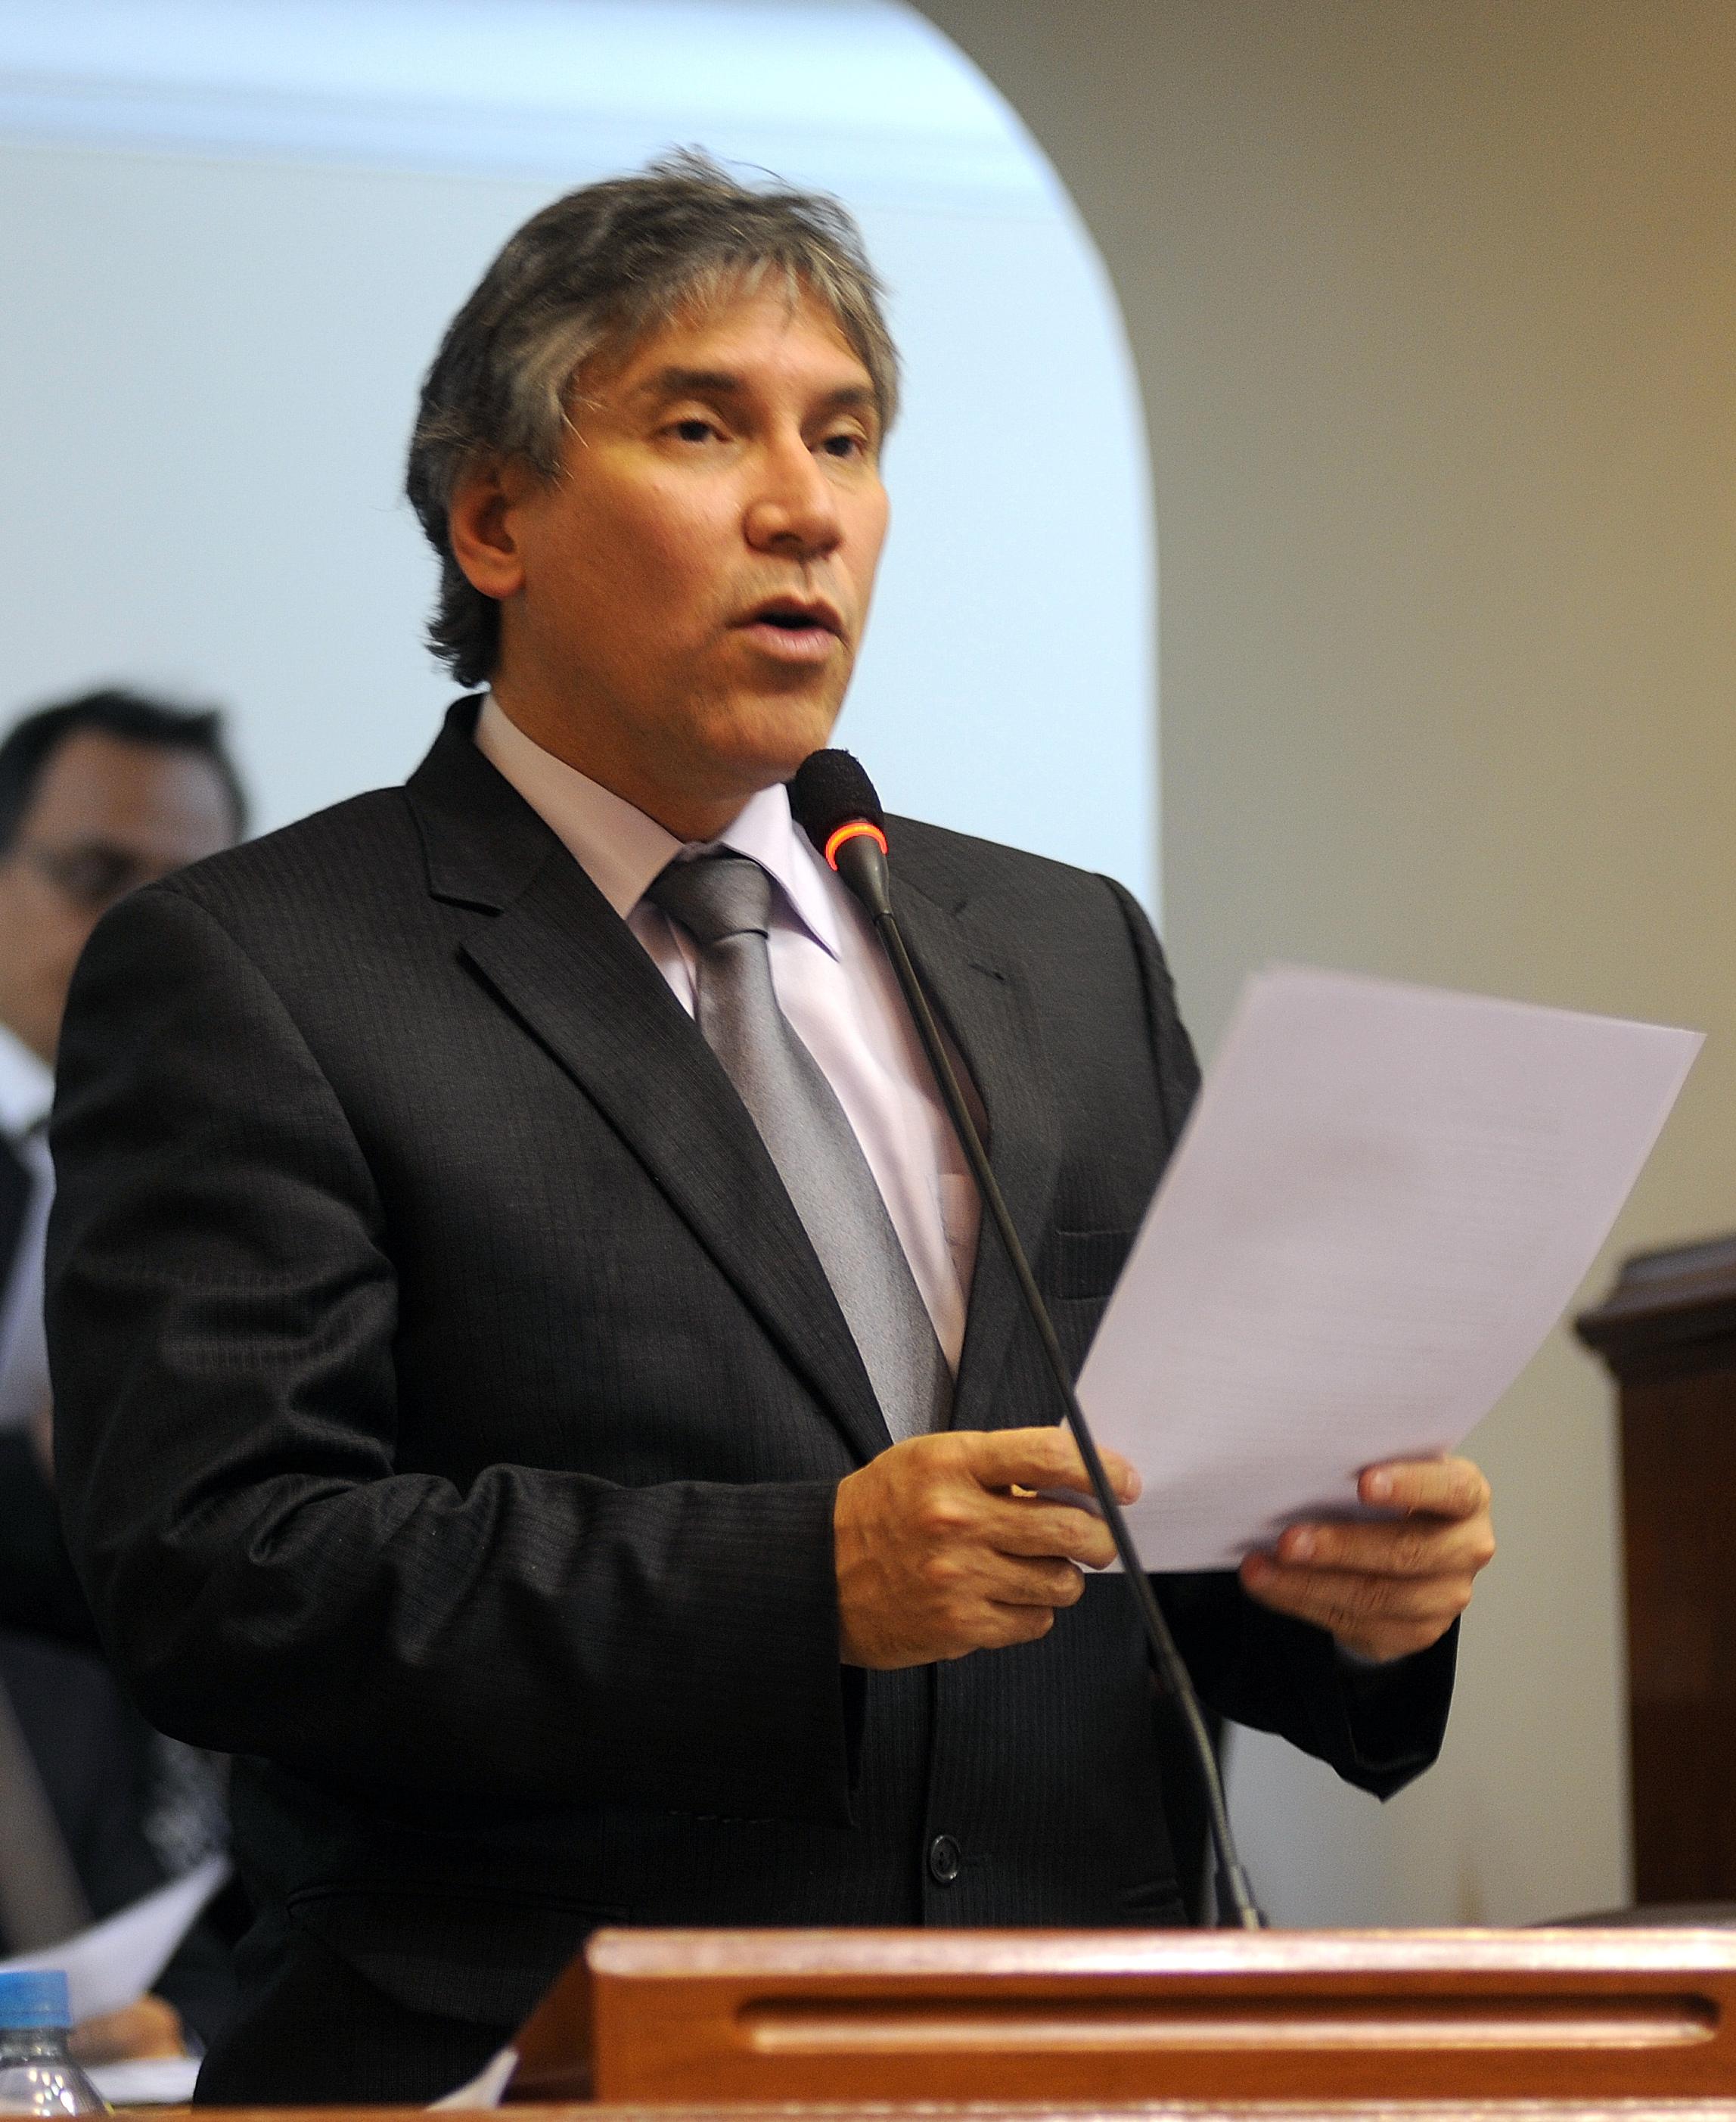 File:Aurelio Pastor 2.jpg - Wikimedia Commons